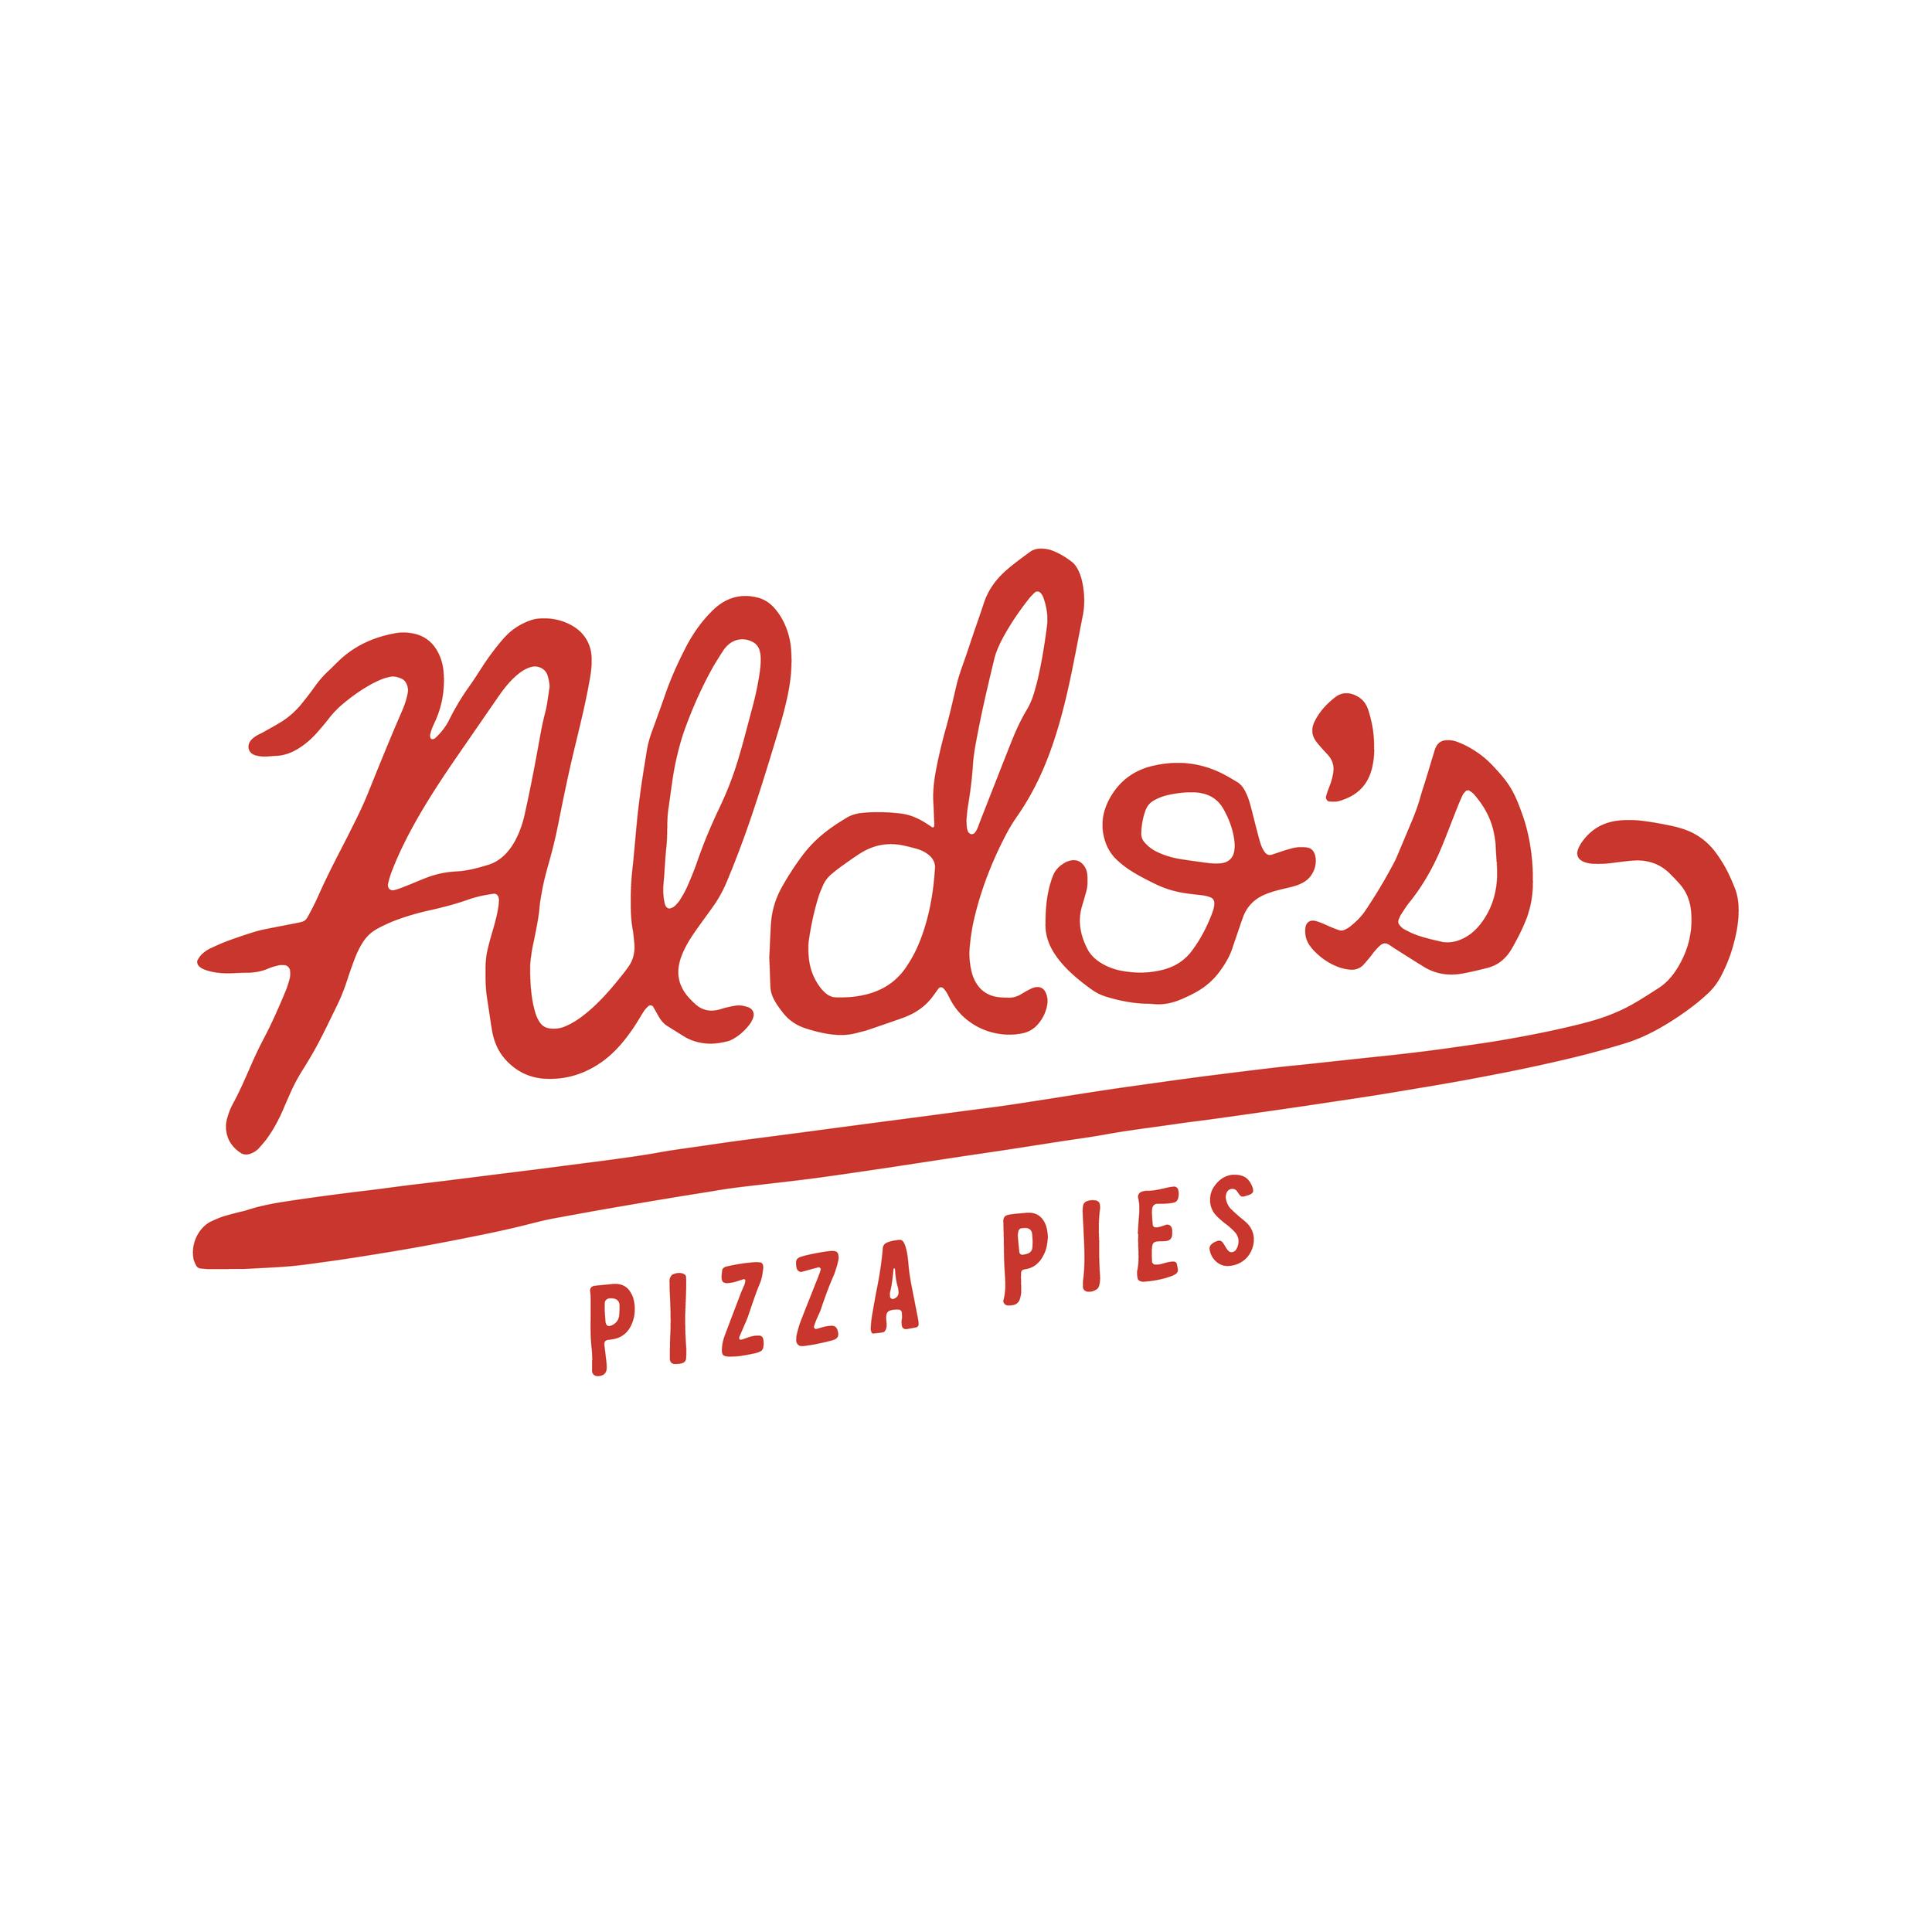 Aldo's Pizza Pies Logo.png